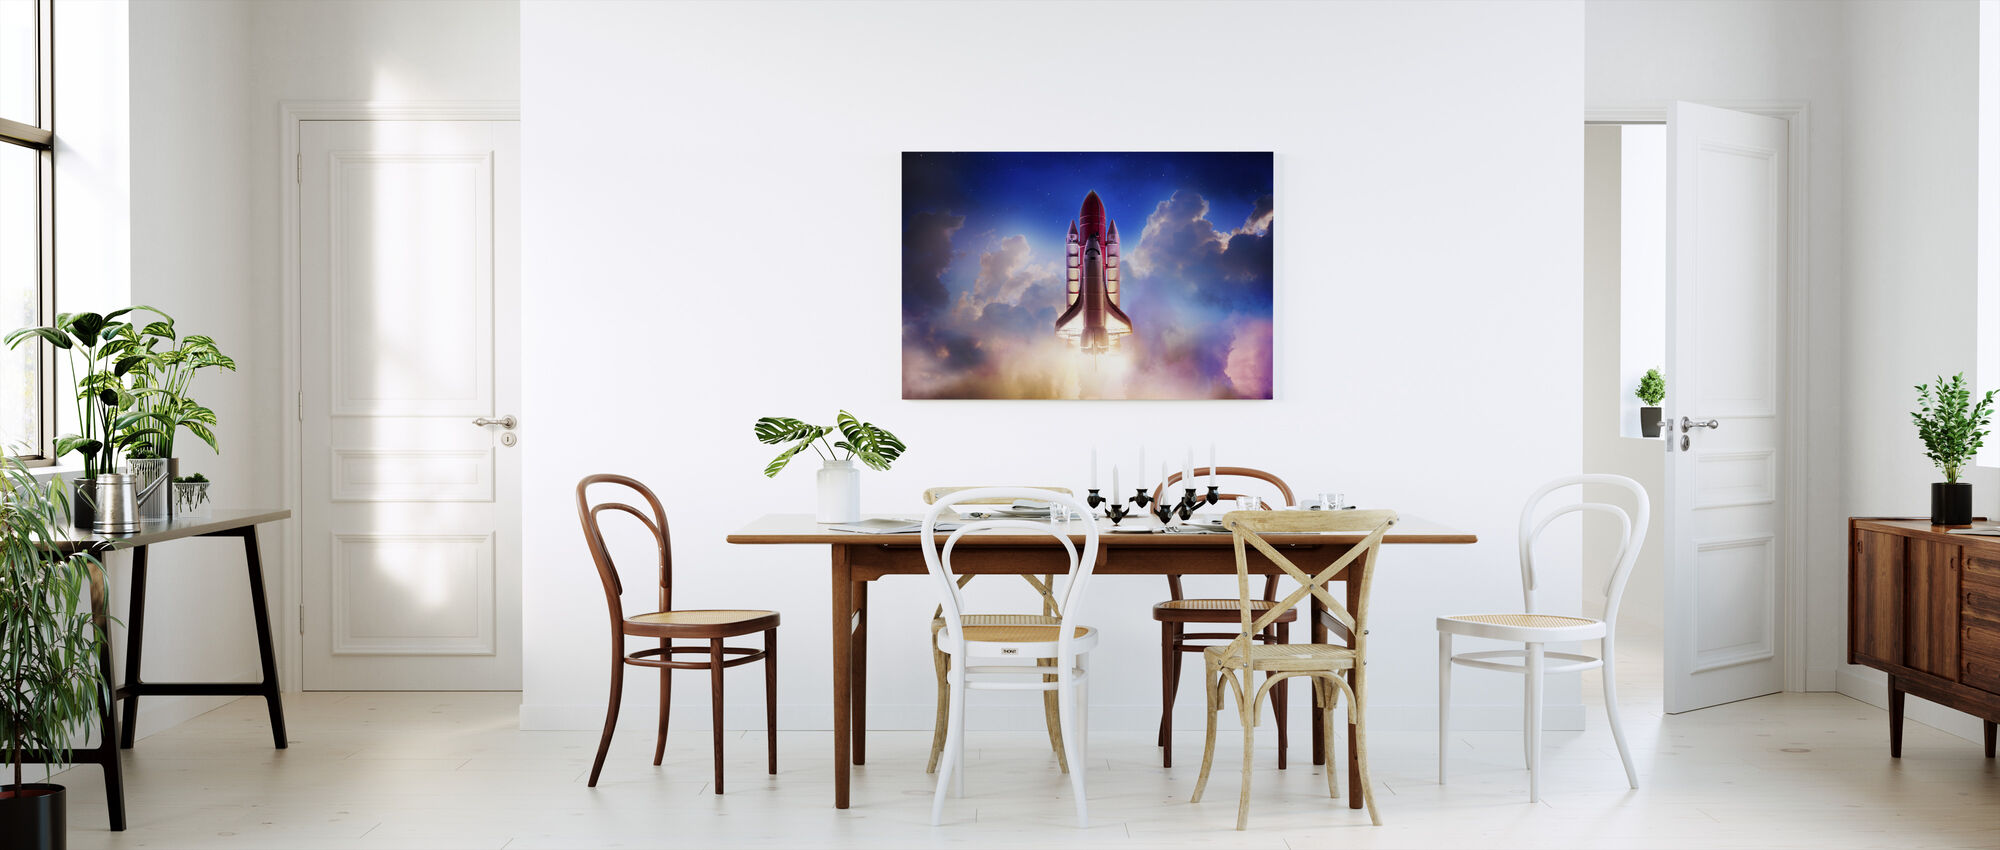 Dragkraft ut i rymden - Canvastavla - Kök